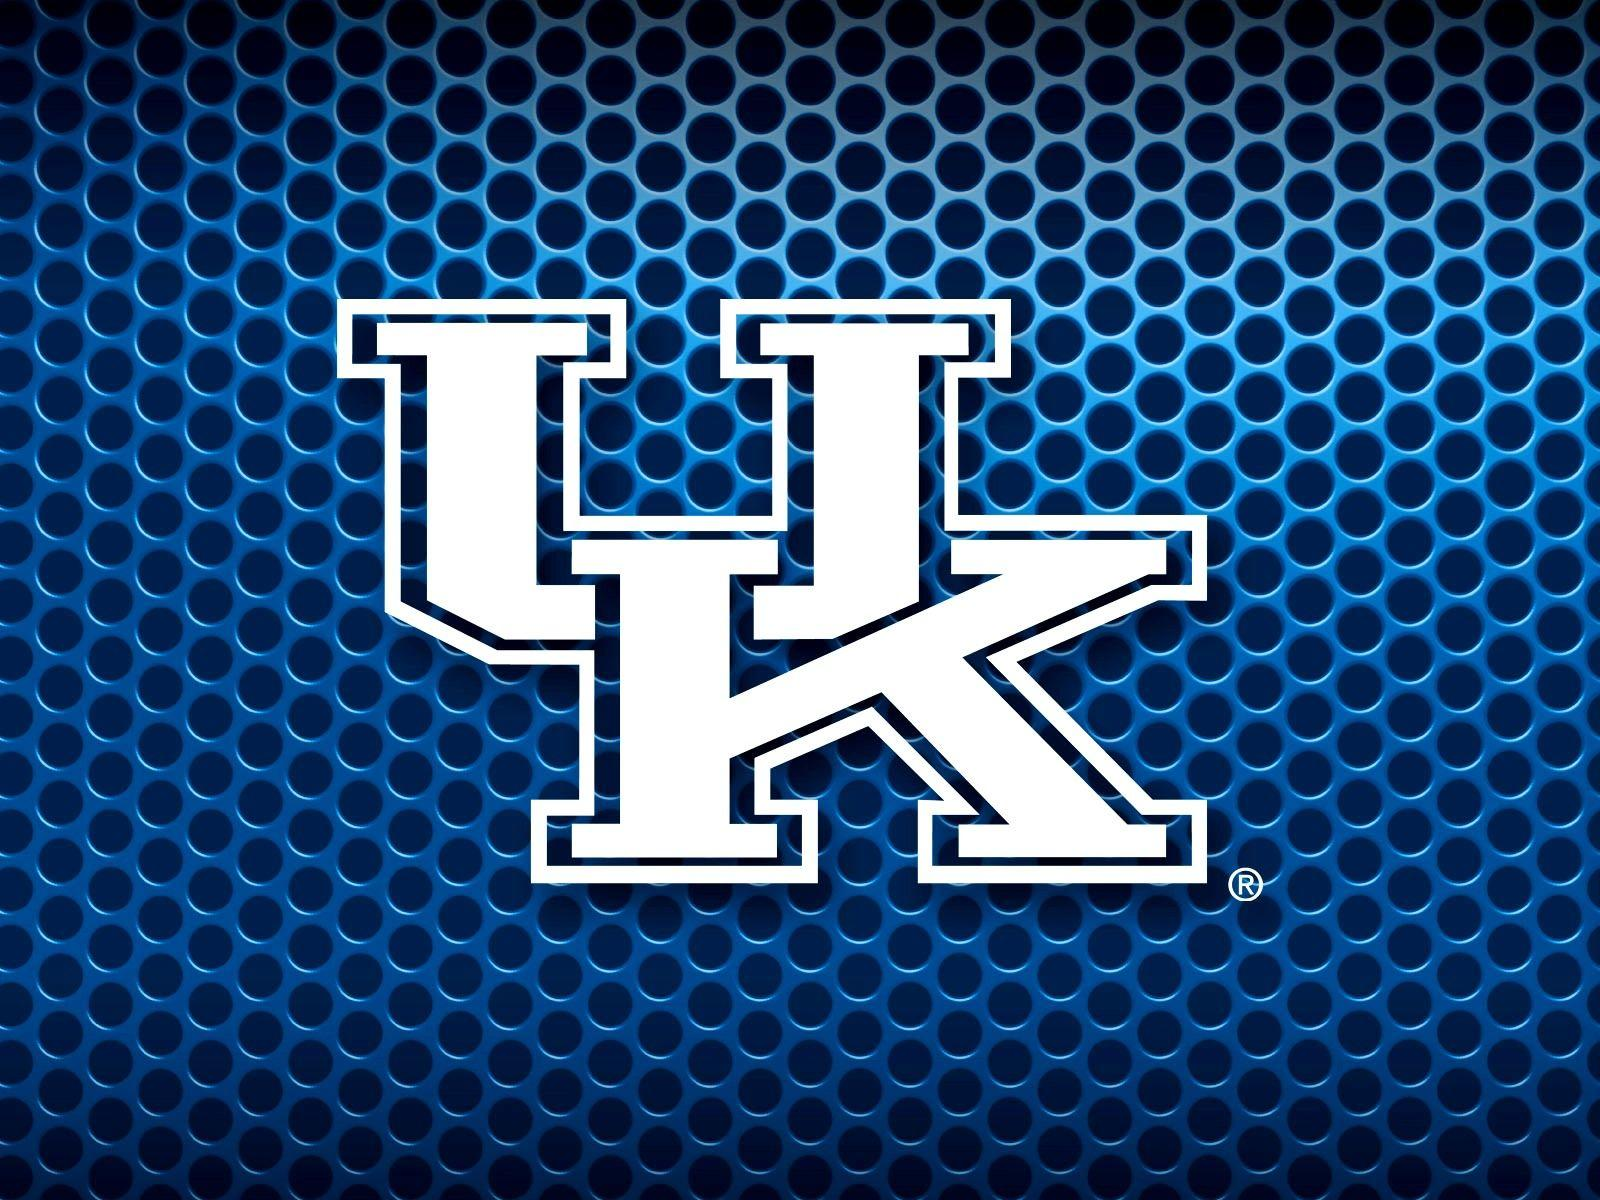 Kentucky Basketball Wallpapers: NBA Team Logos Wallpapers 2015